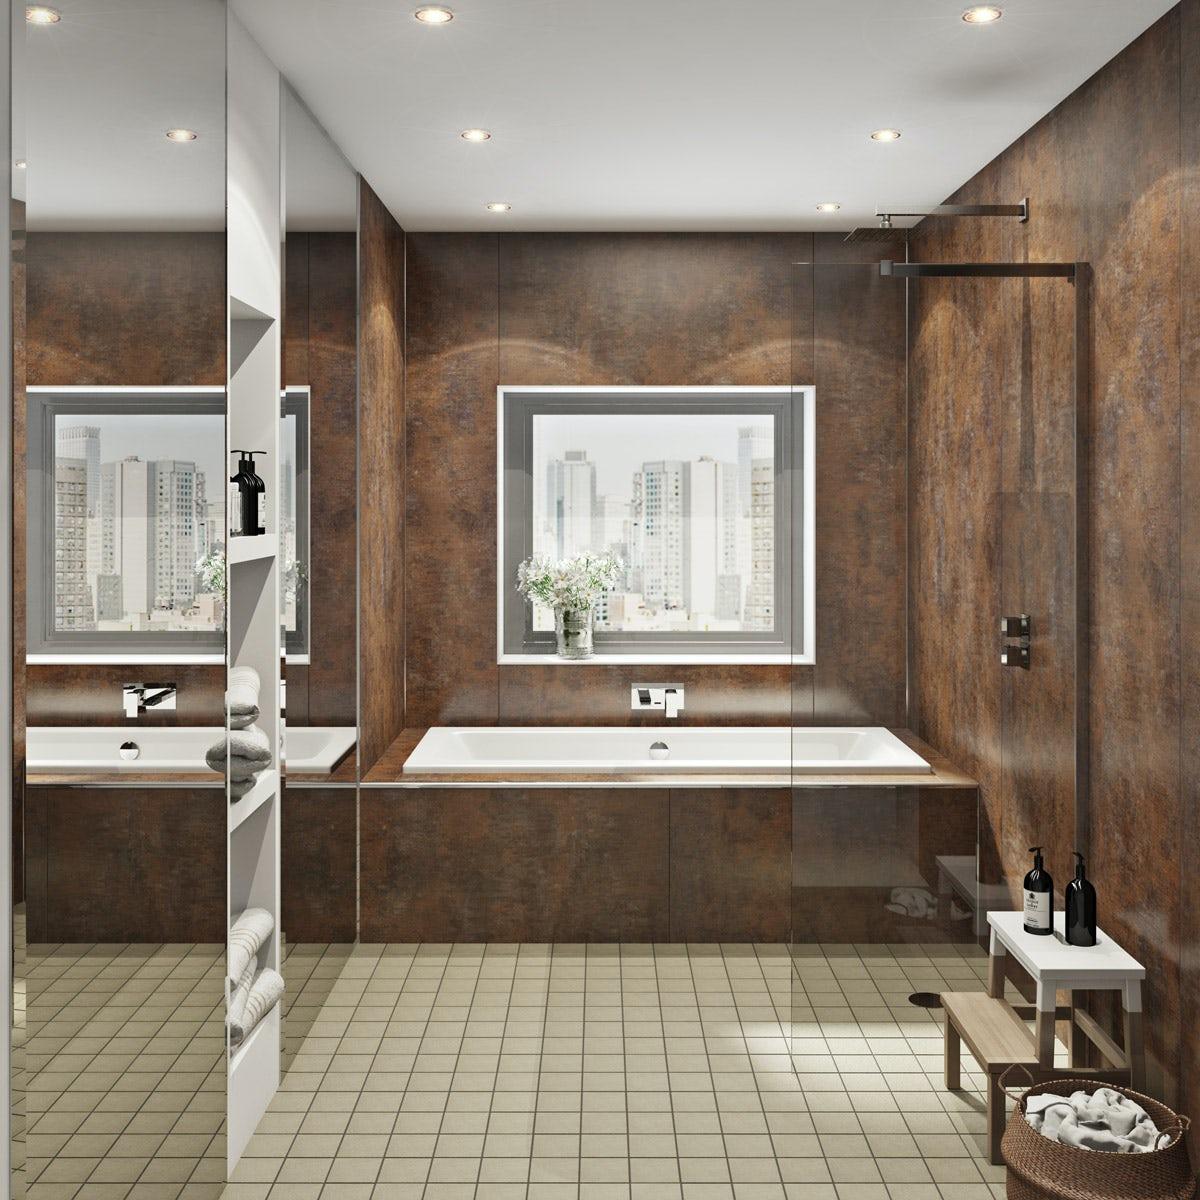 Multipanel Linda Barker Corten Elements Hydrolock Shower